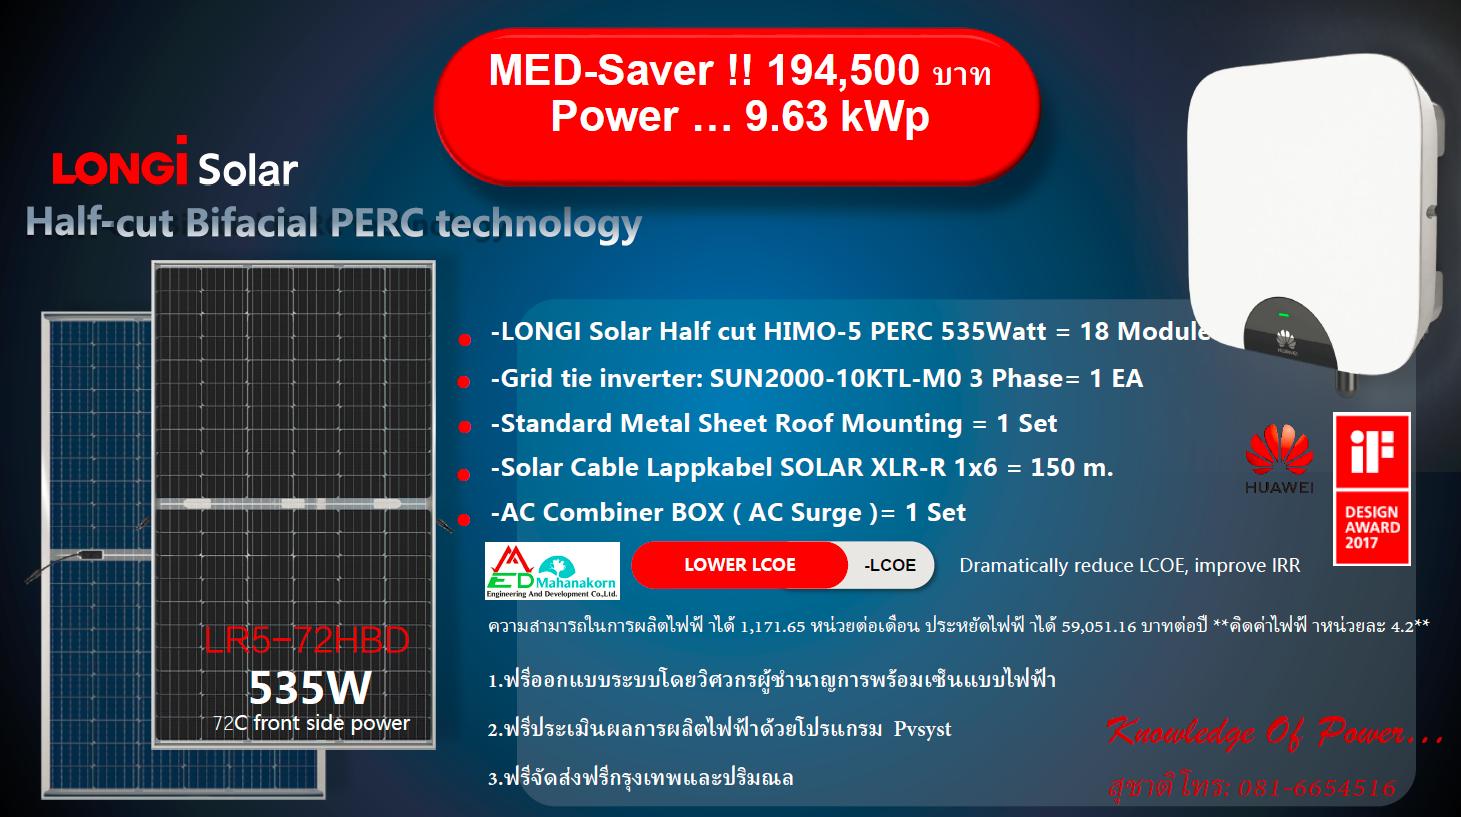 solarcellcenter.com/img/cms/MED Promotion Solar Rooftop 2562/Promotion Solar Rooftop 9.63kWp